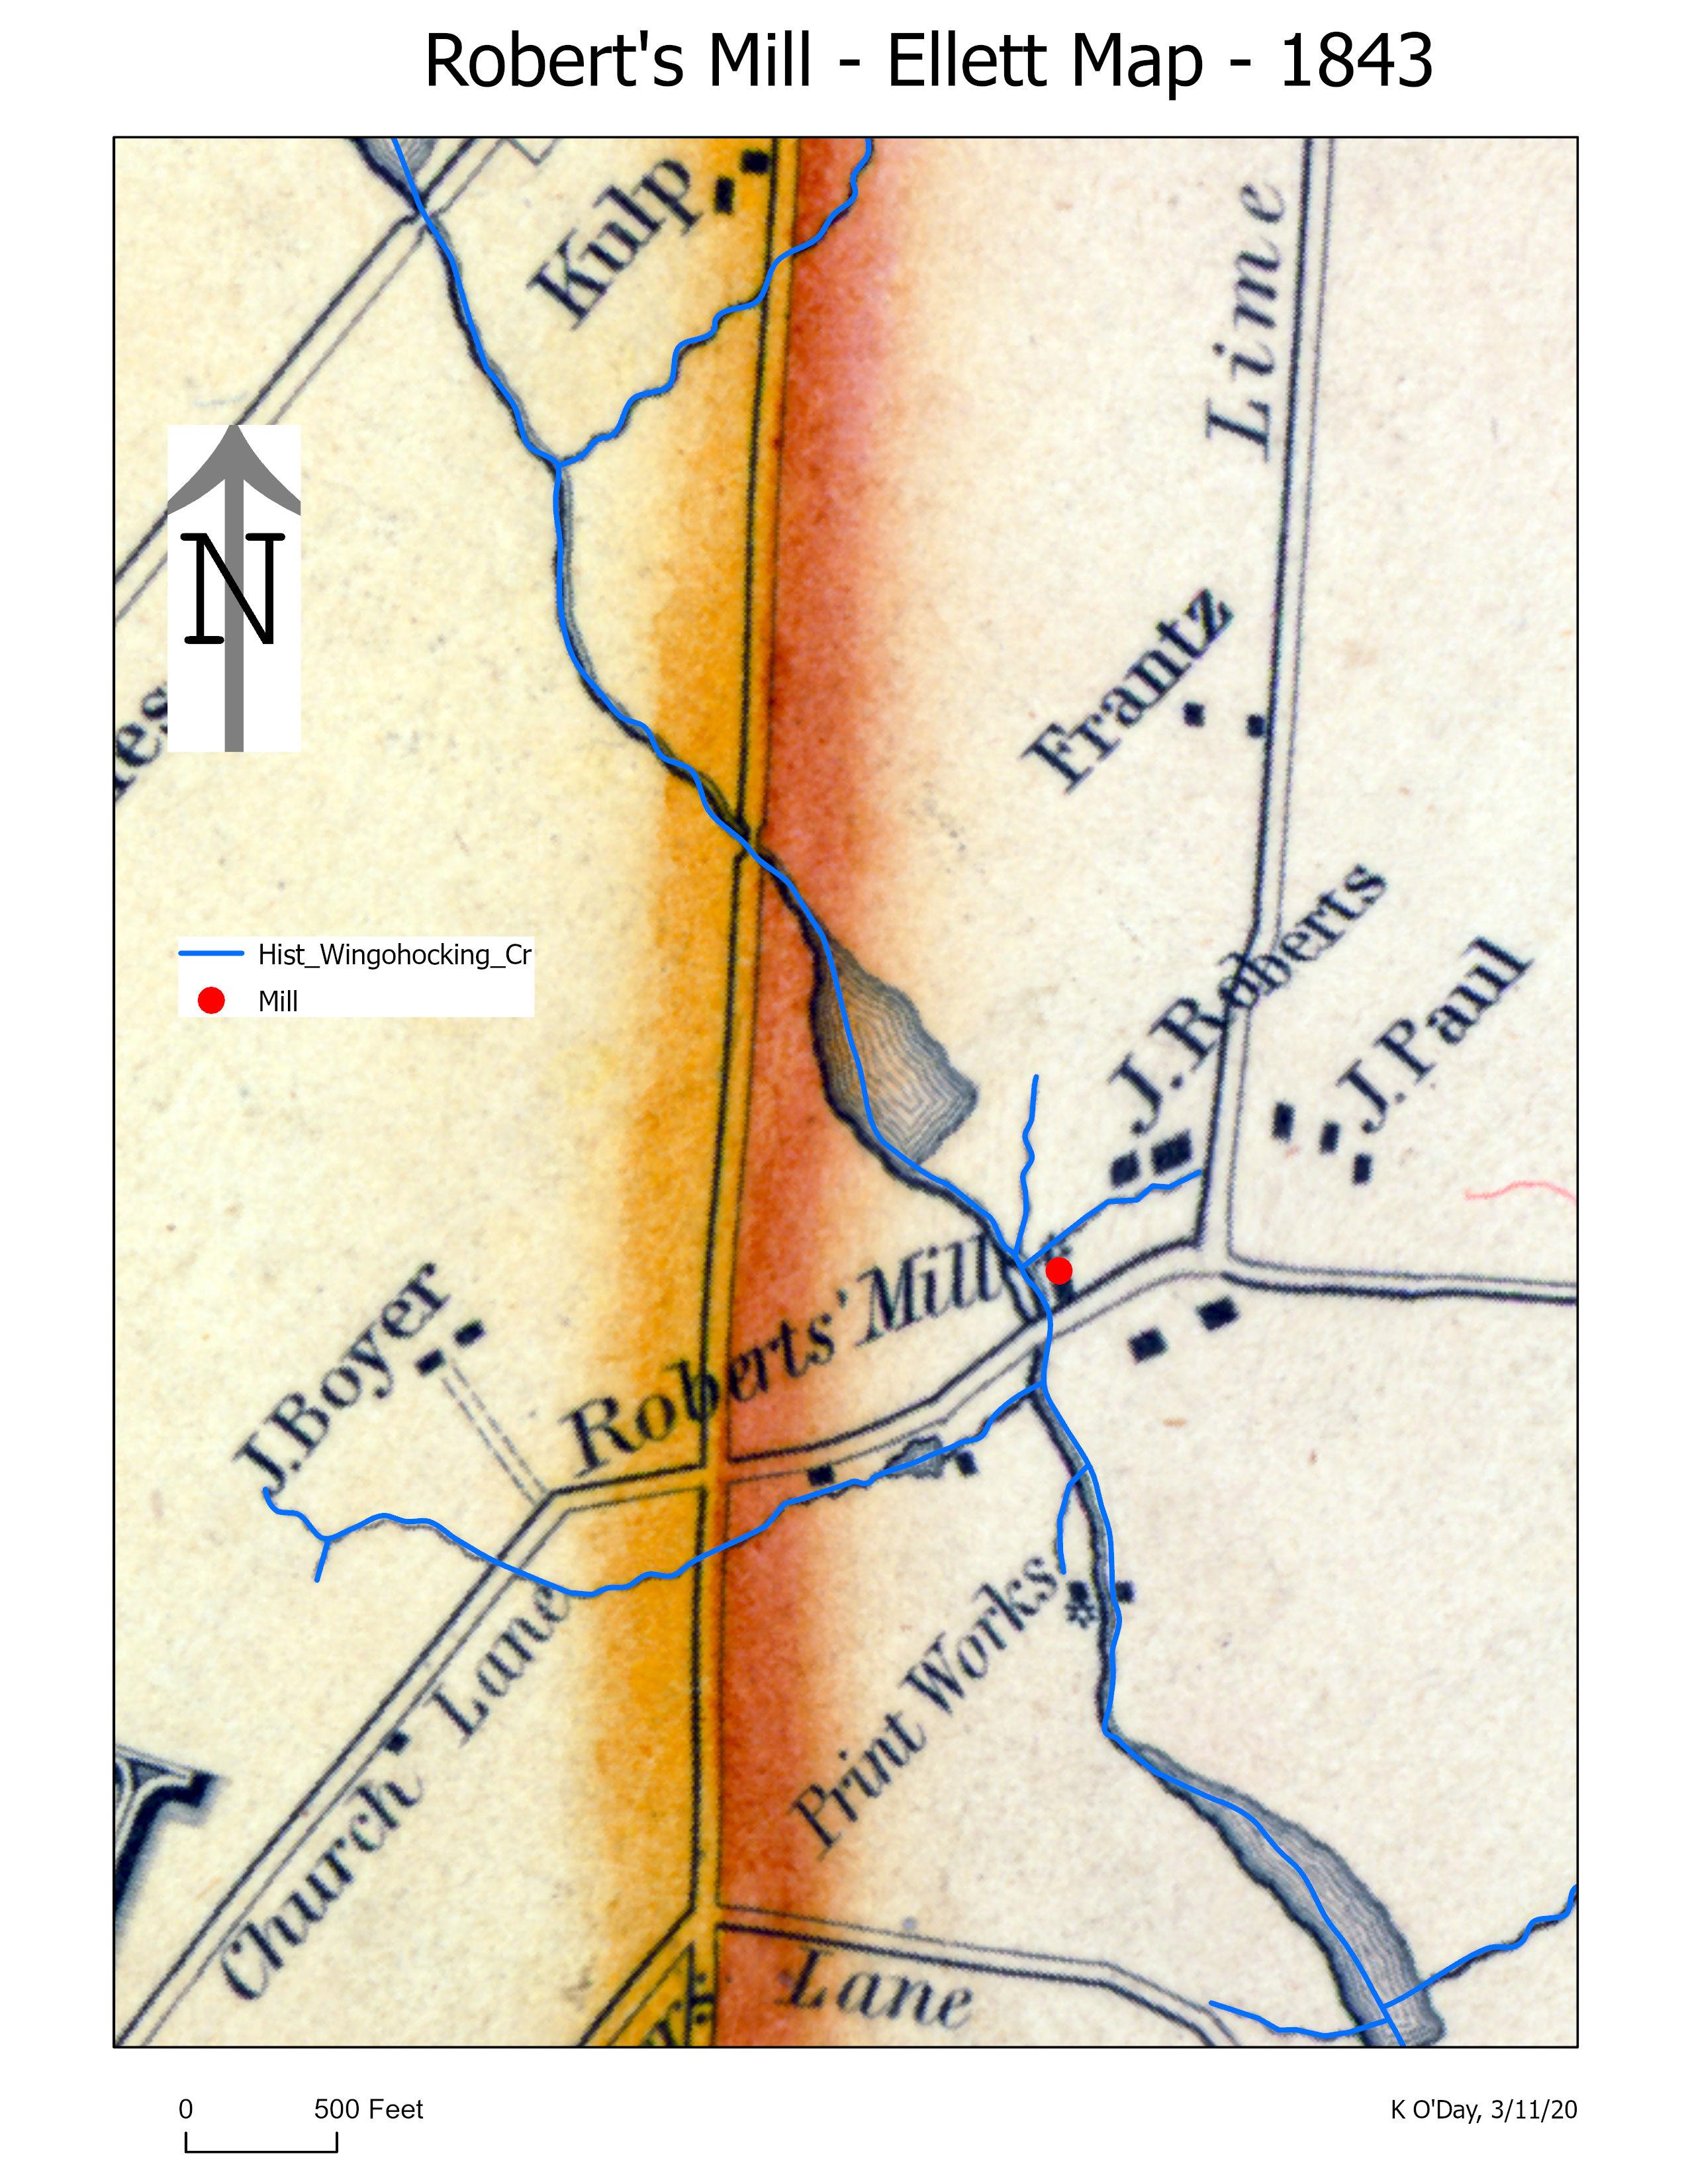 Roberts_Mill_Ellett_Map